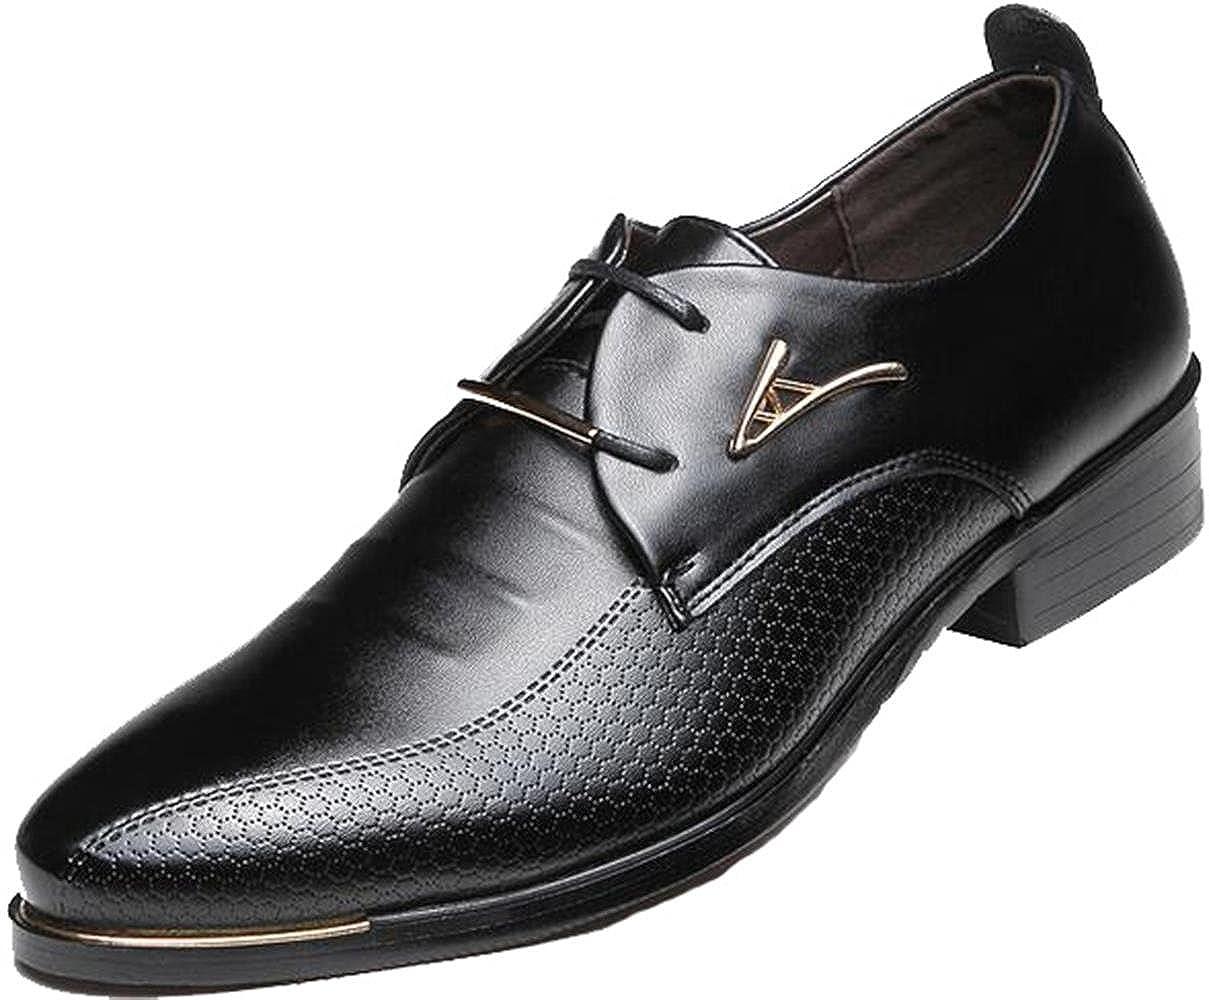 2809ec8f6fadd DADAWEN Men's Business British Pointed-Toe Oxford Shoes Four Seasons Dress  Shoes